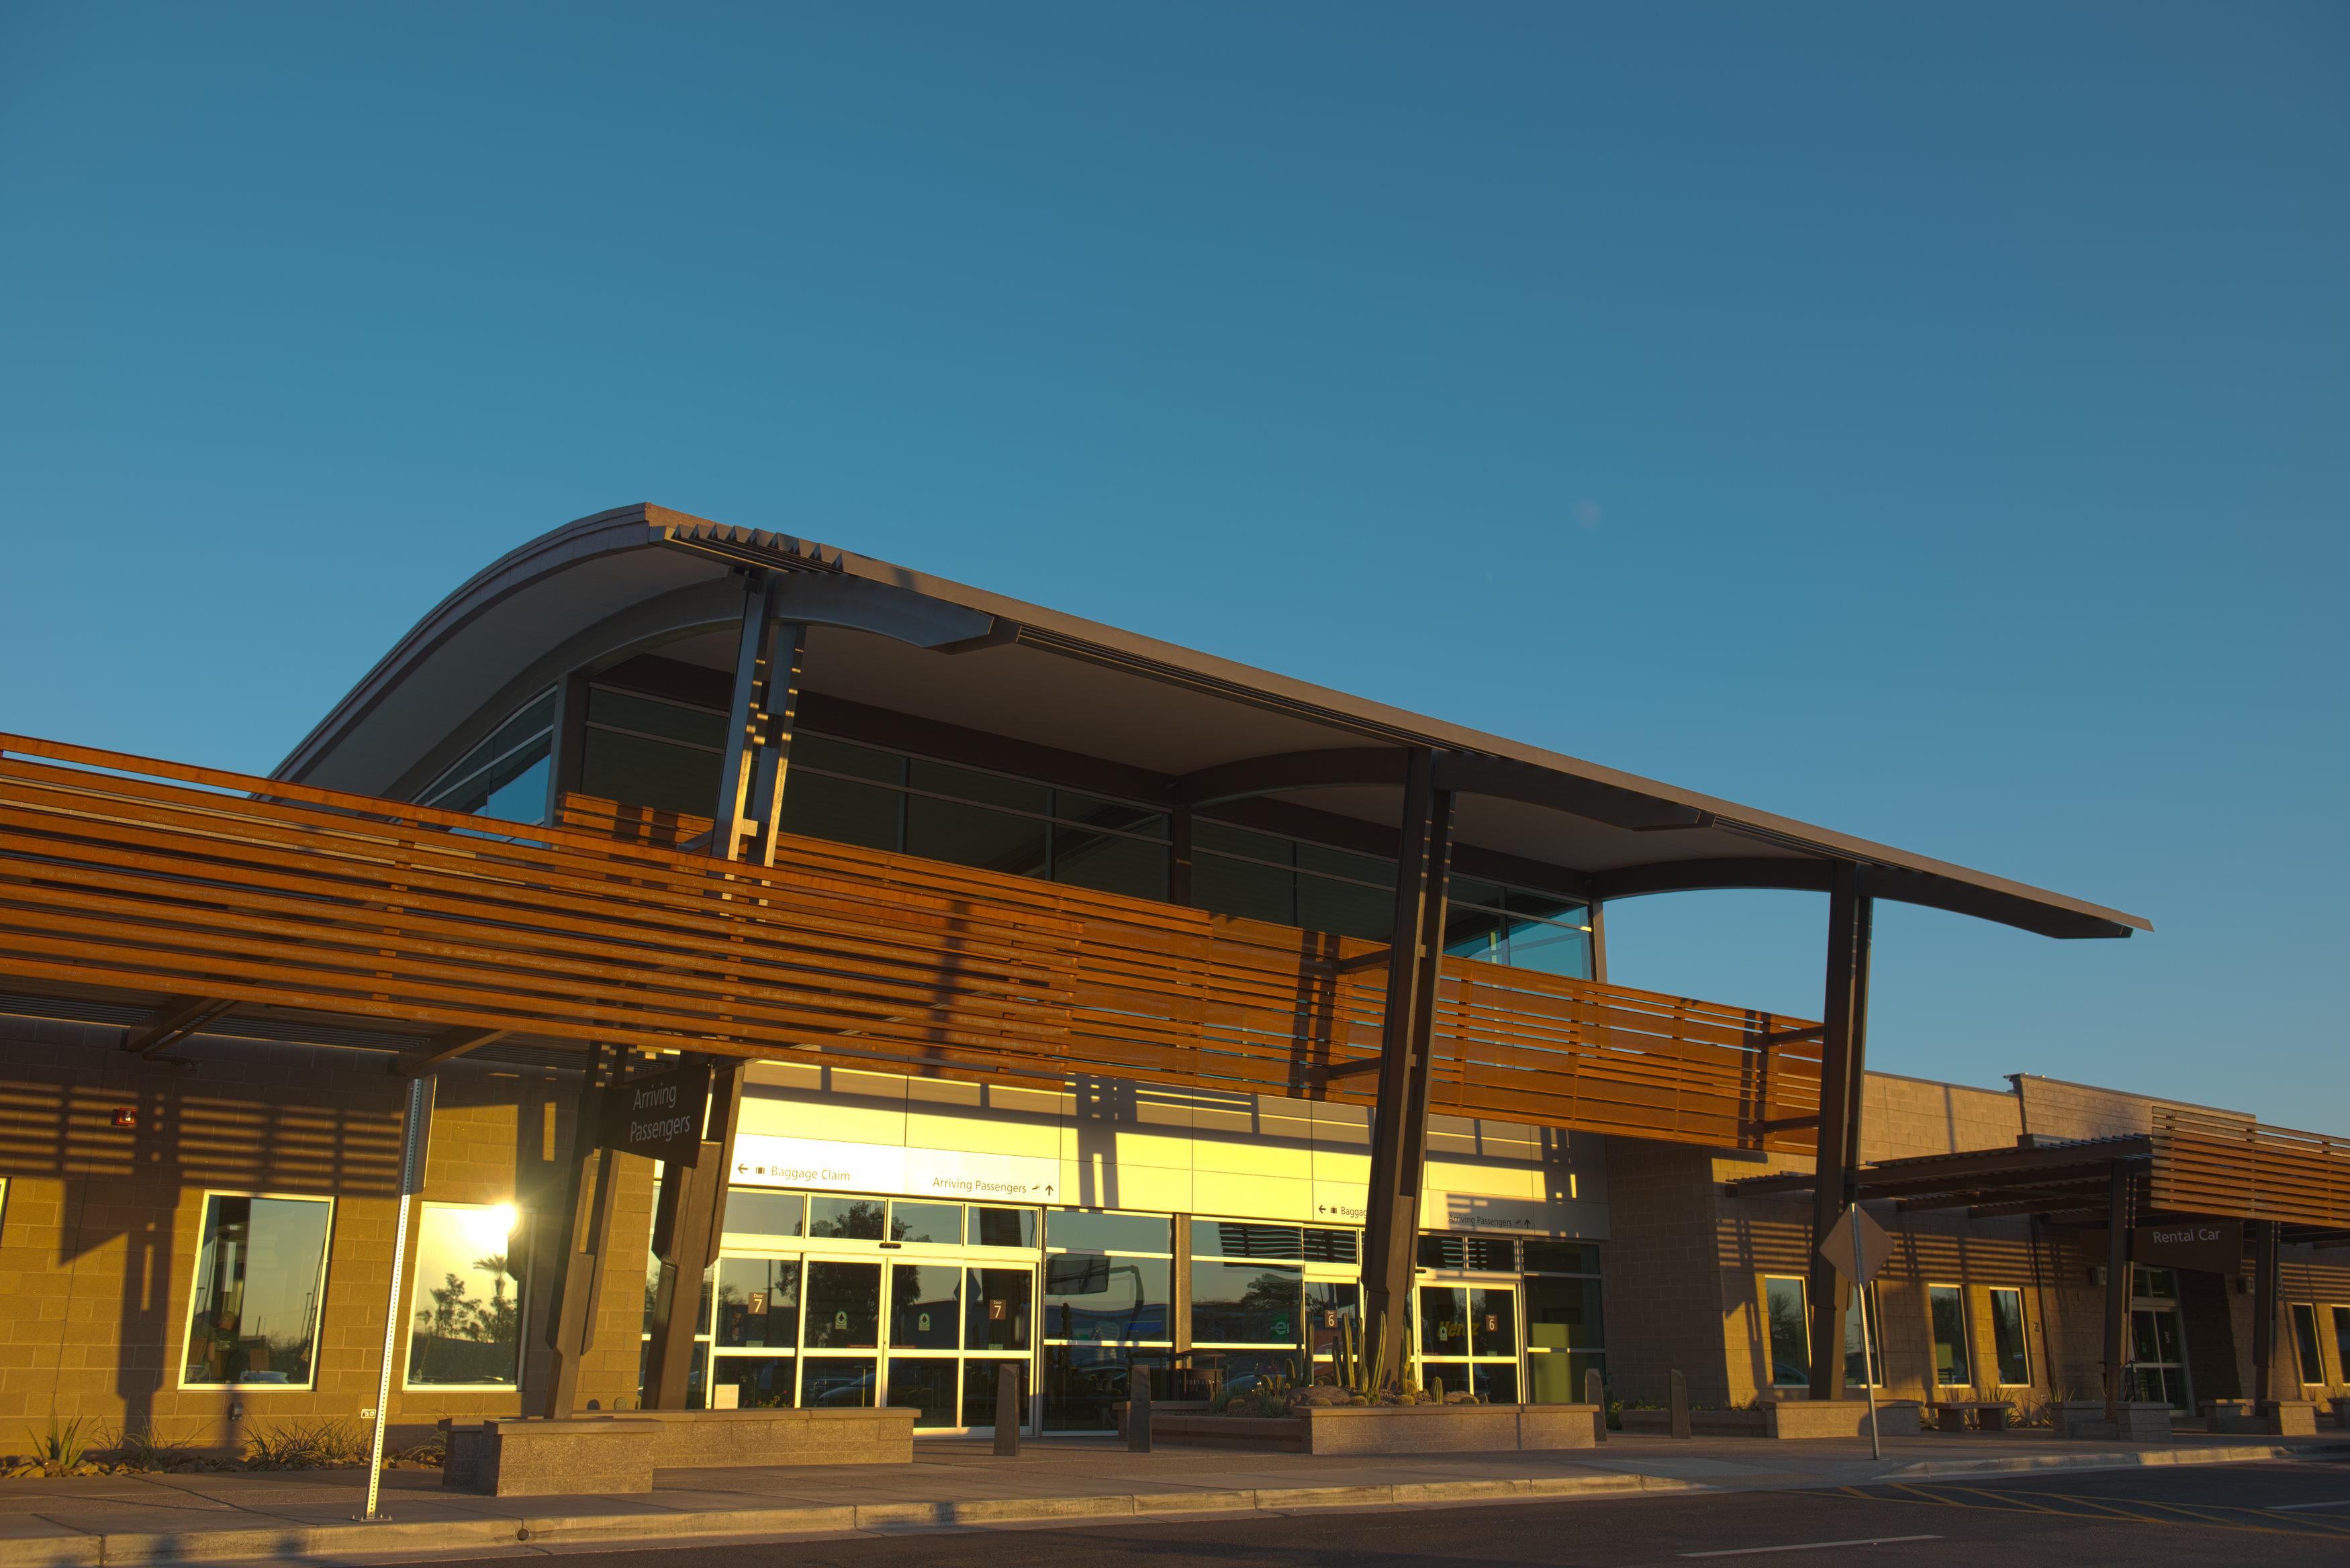 PhoenixMesa Gateway Airport  Wiki  Everipedia